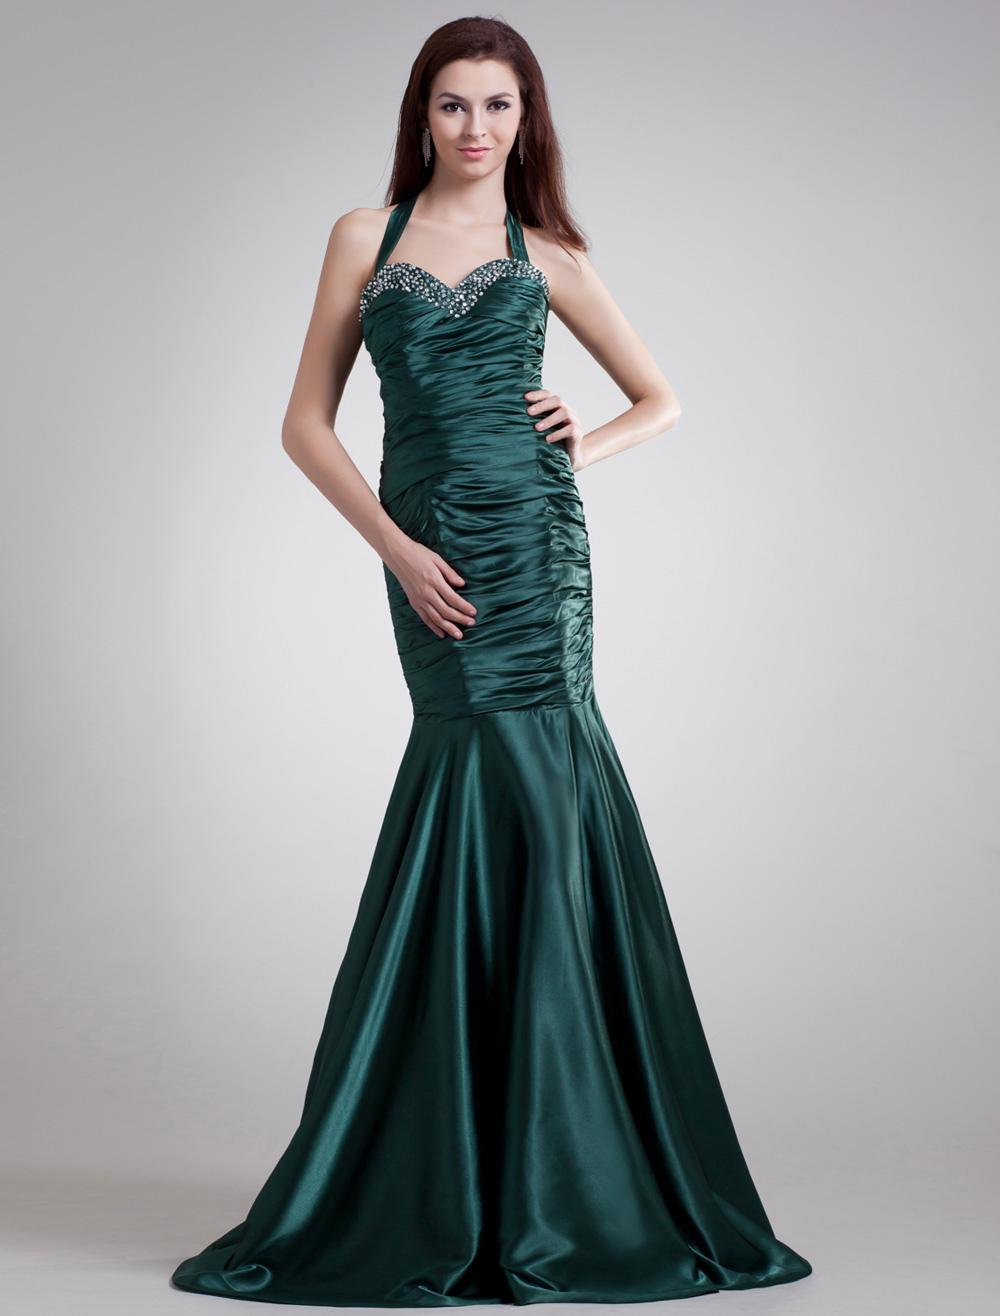 Charming Dark Green Halter Beading Ball Gown Evening Dress (Wedding Evening Dresses) photo